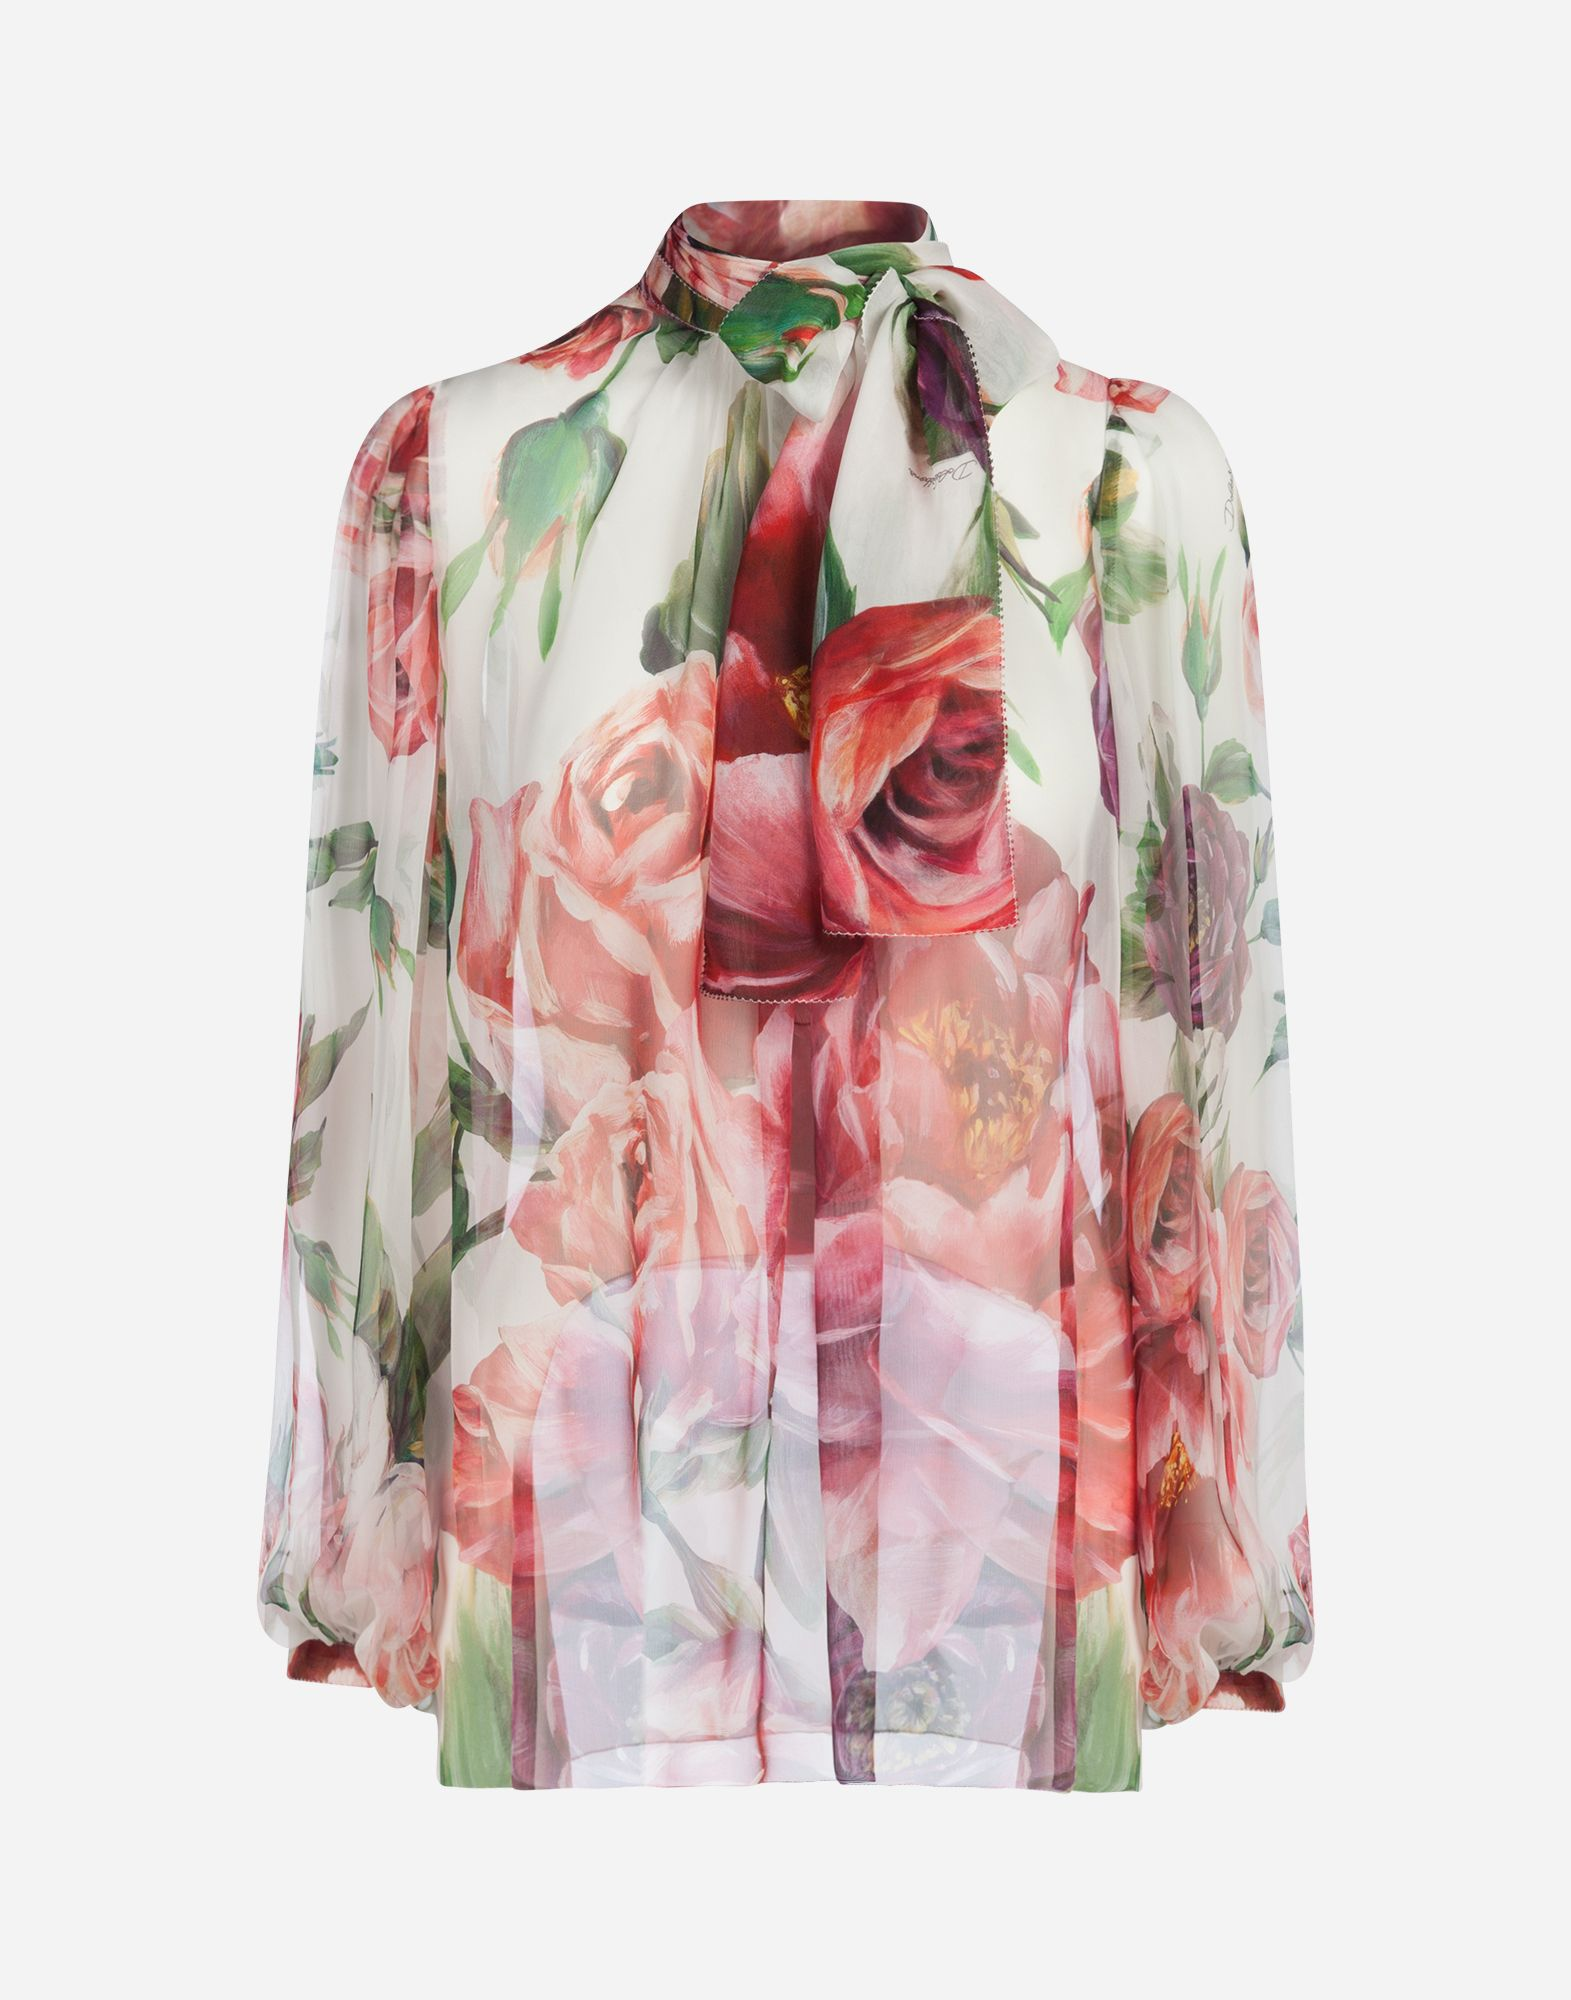 83b5878727ba0e Dolce & Gabbana - Peony-print silk blouse ($1,375) Peony Print, Floral